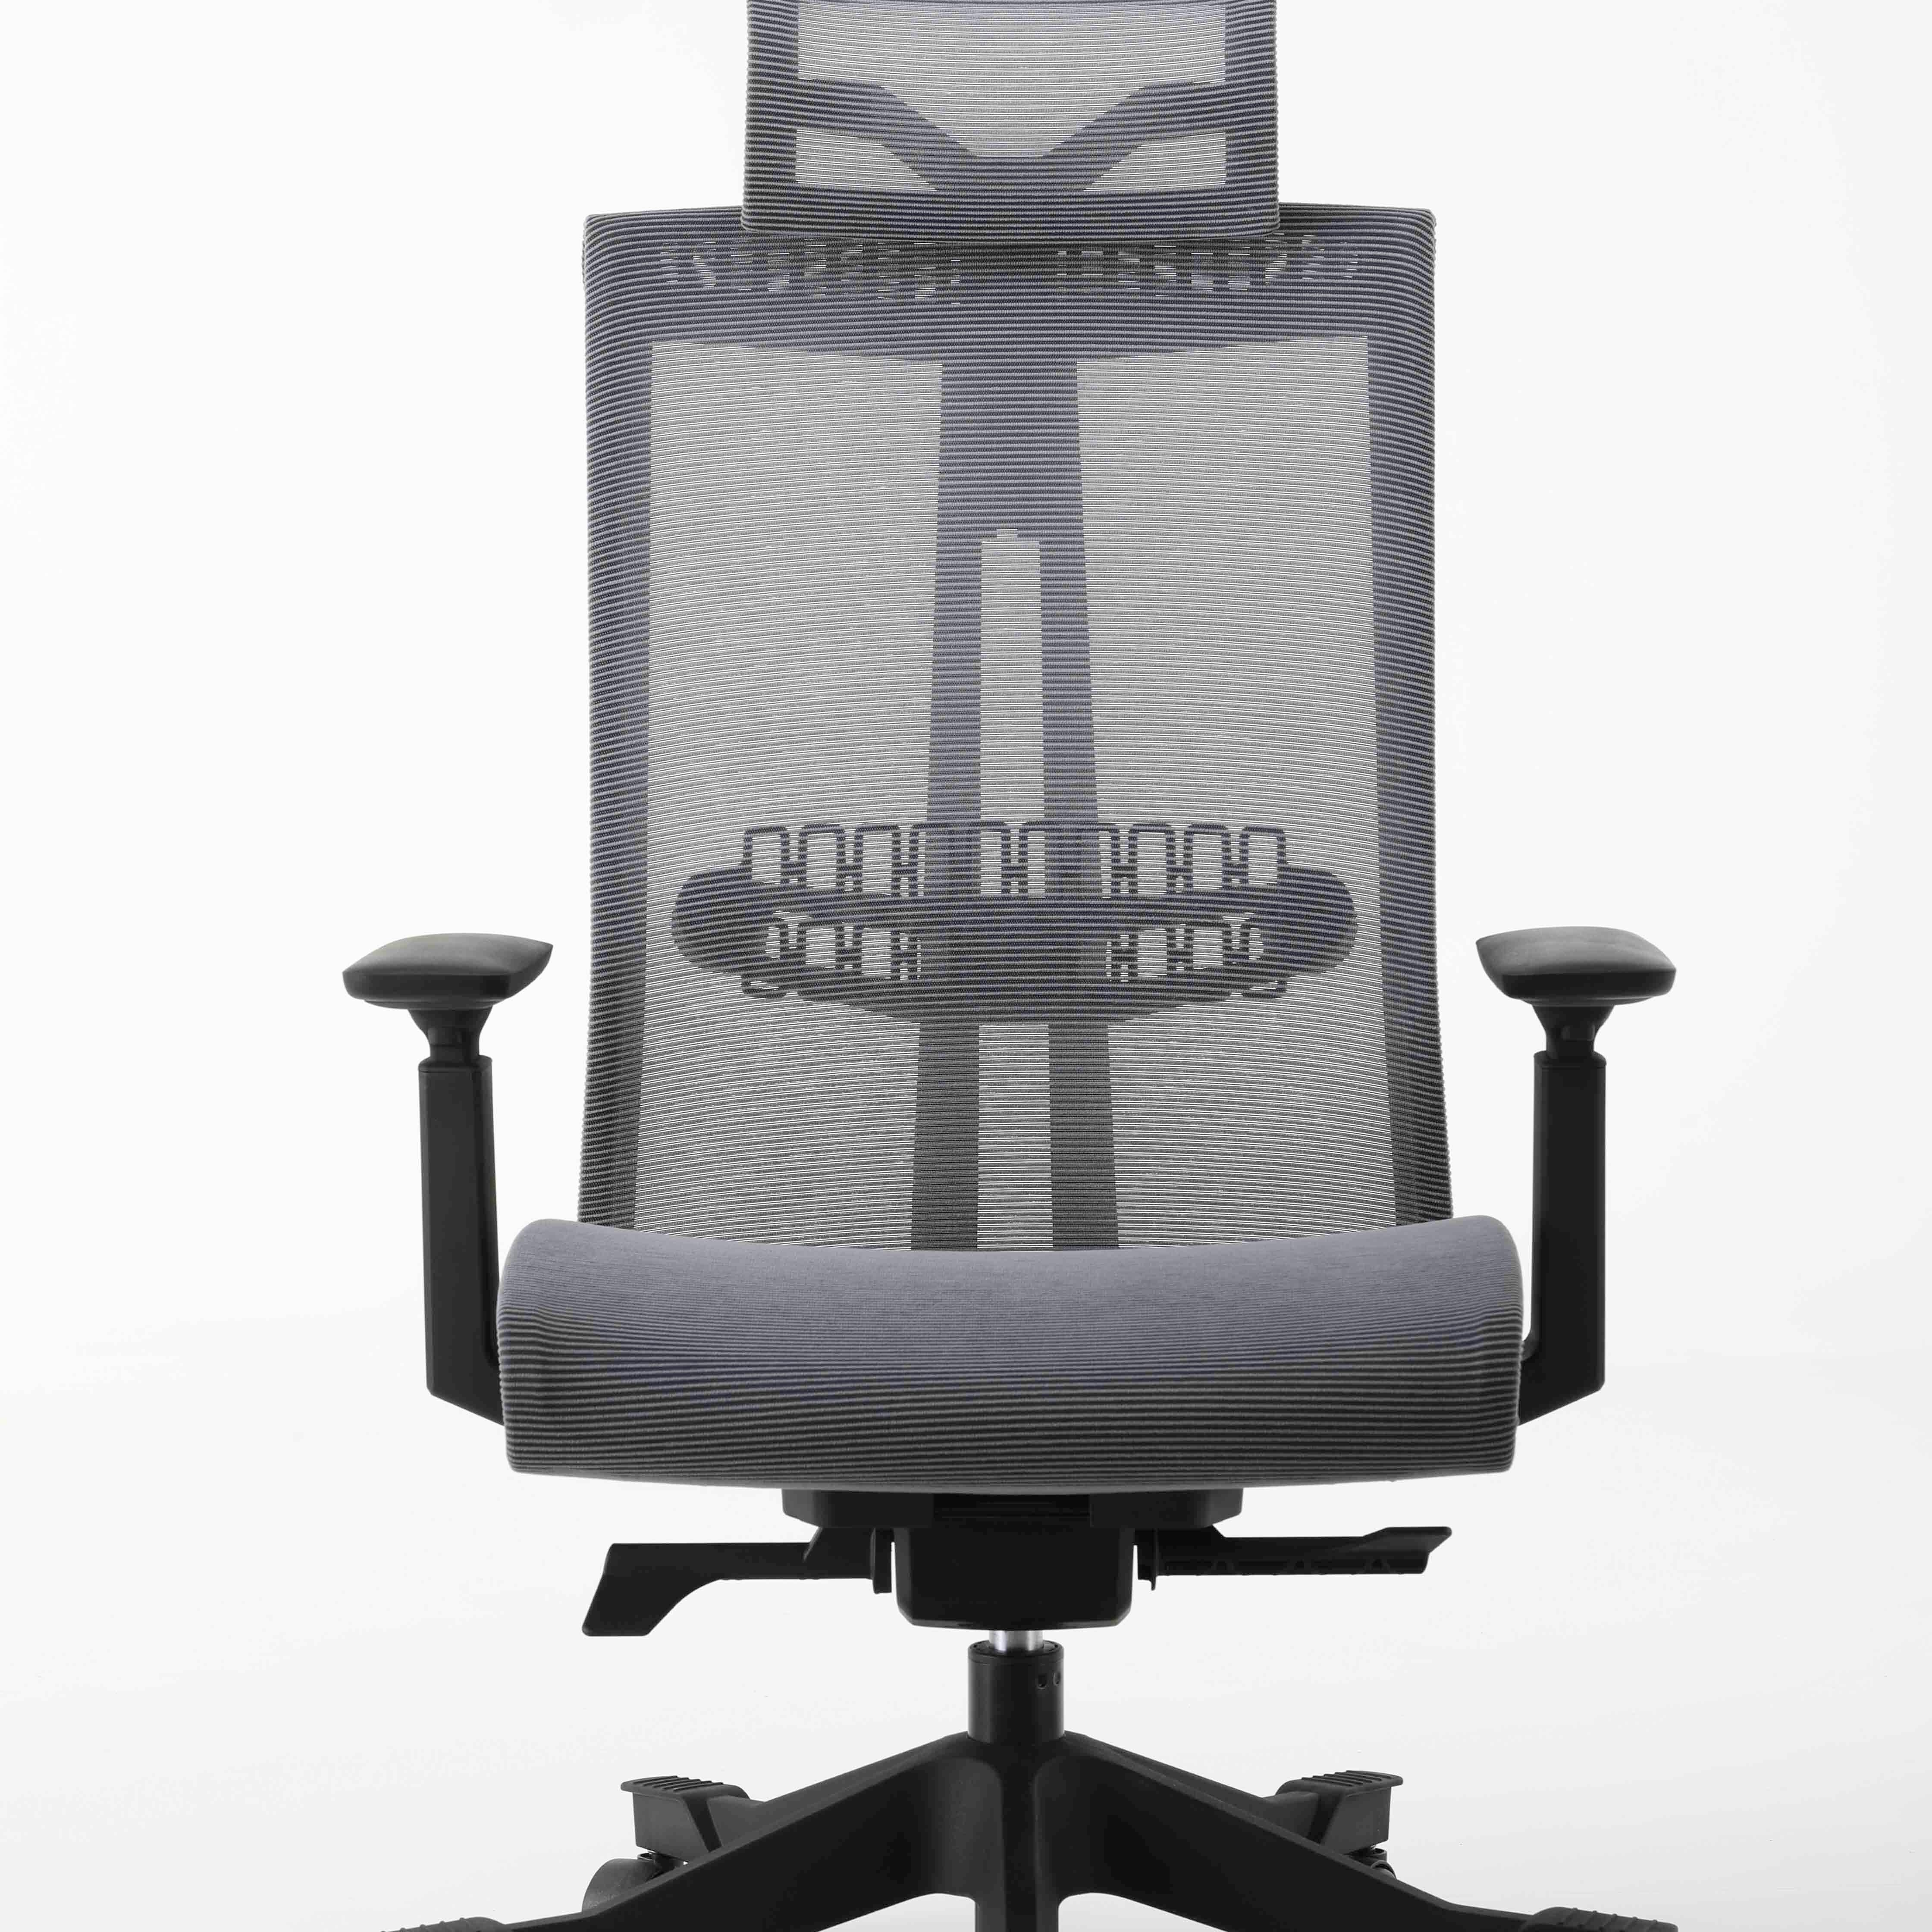 Motostuhl S6 Executive Ergonomic Office Chair Fabric High Tech Rotating Product On Alibaba